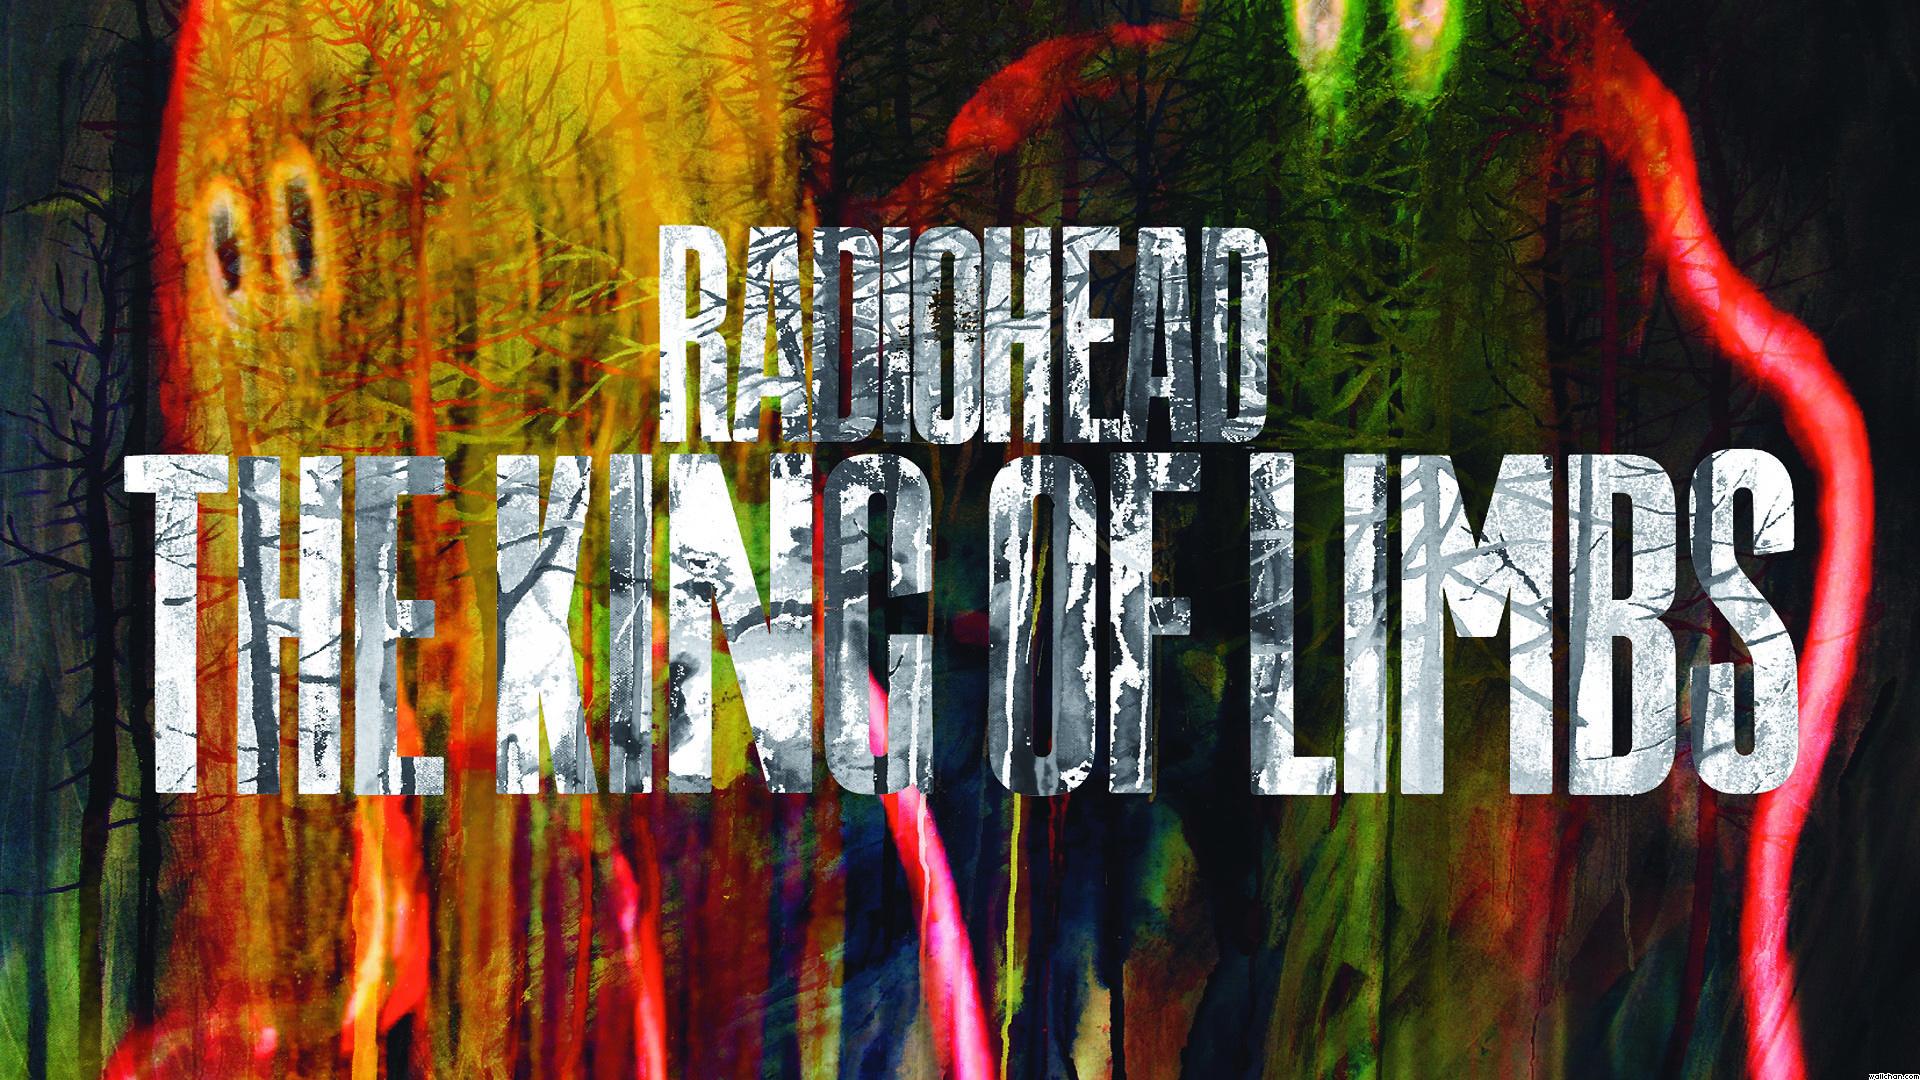 Radiohead The Amazing Sound Of Orgysample